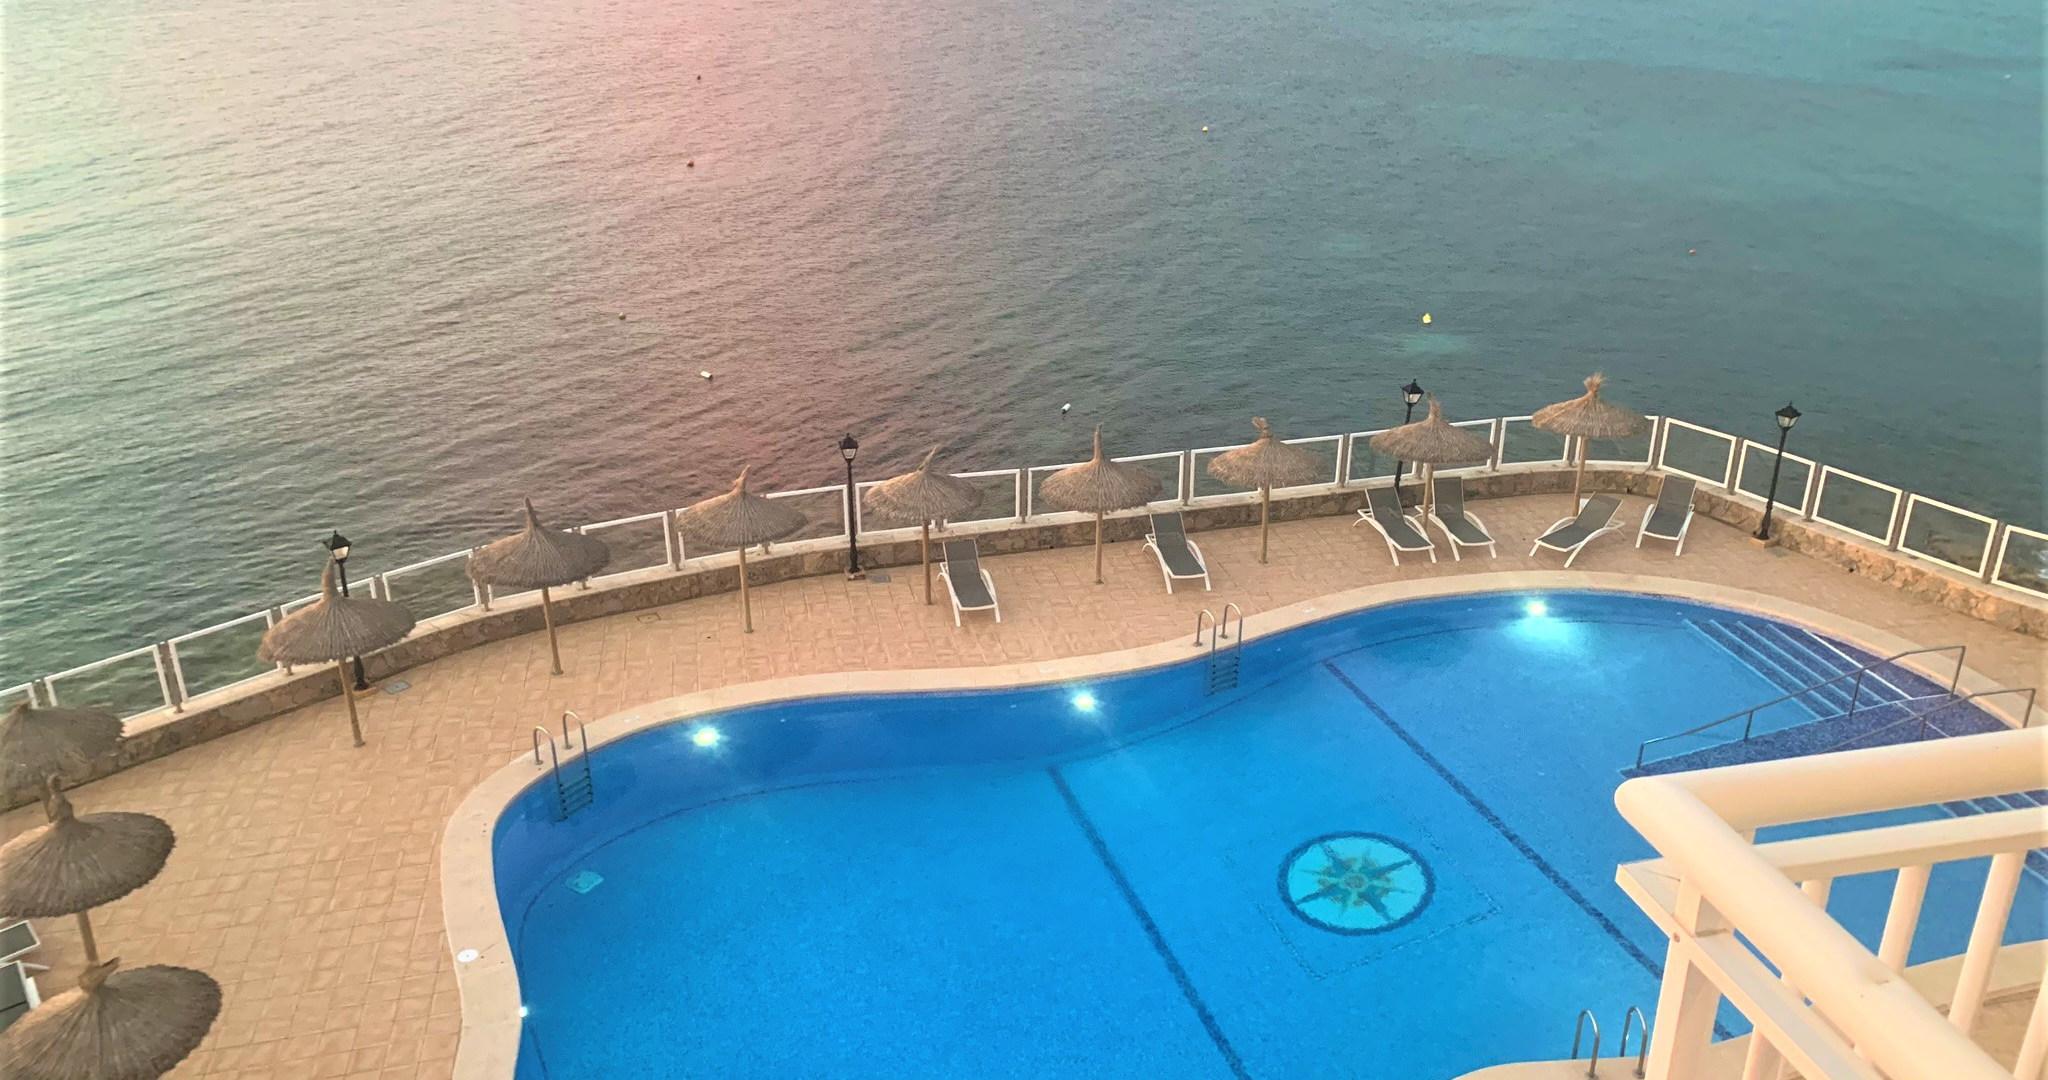 Pool at sunset.JPEG